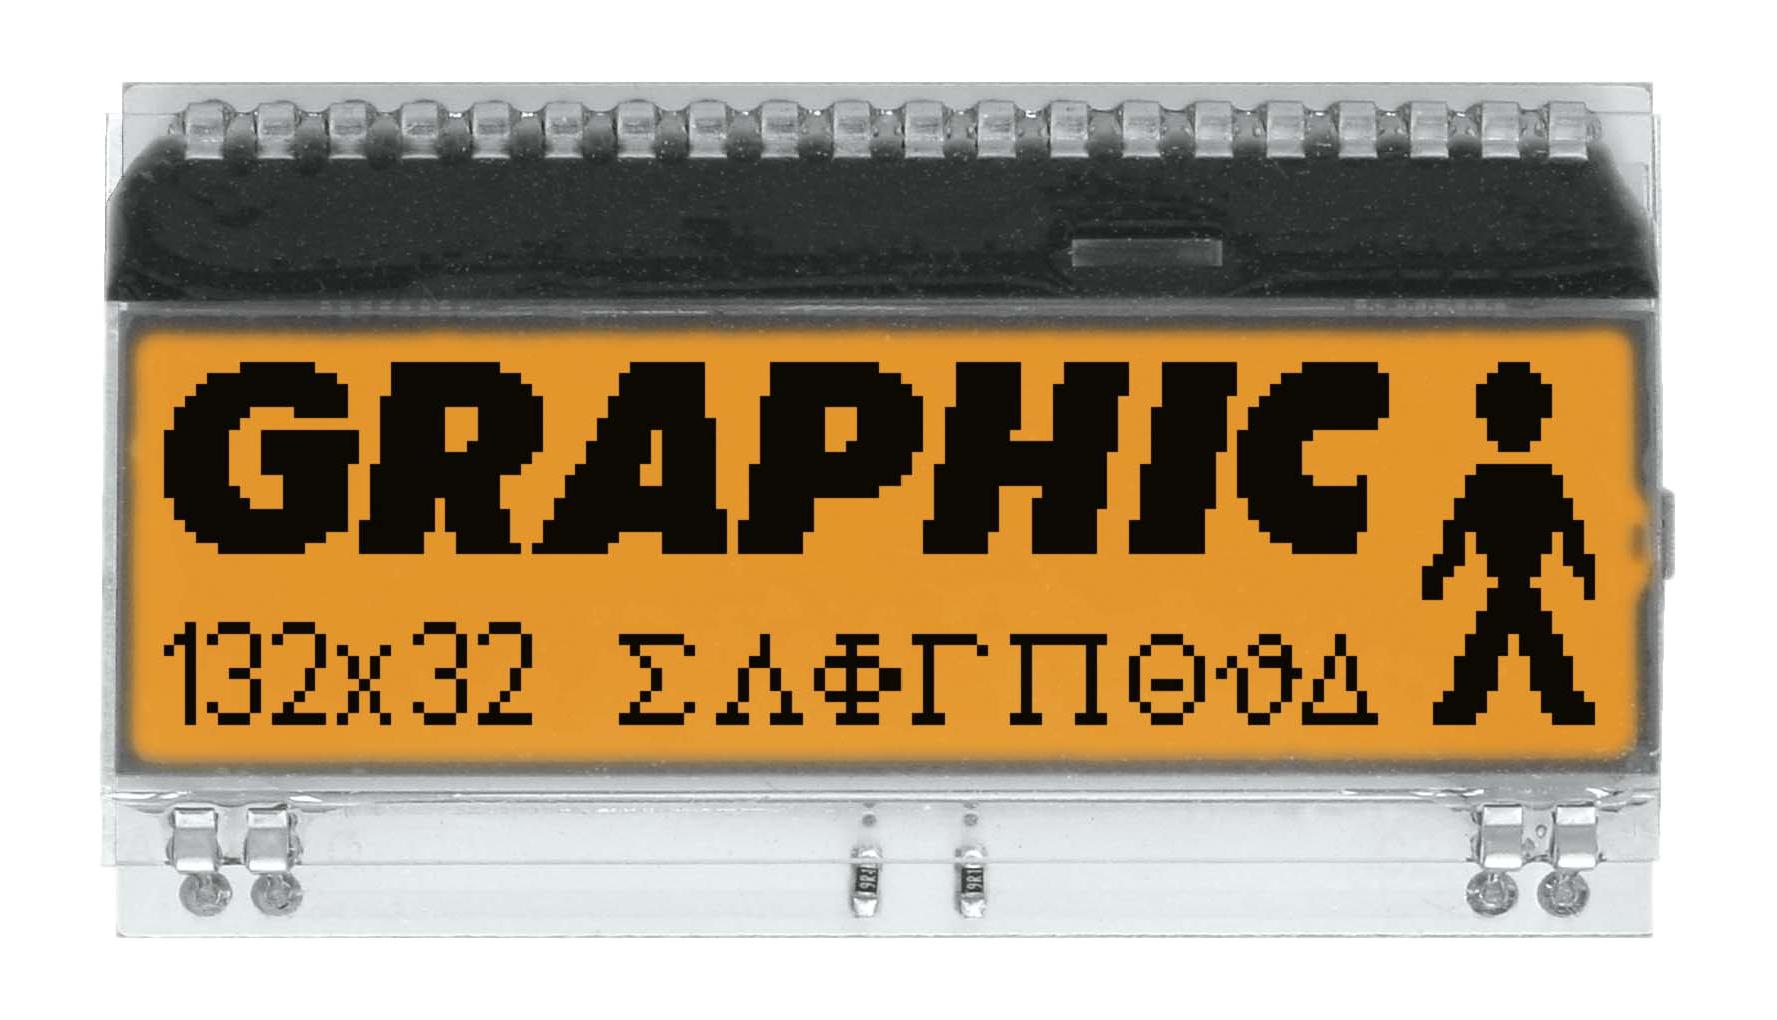 132x32 DOG Grafikdisplay, FSTN weiss